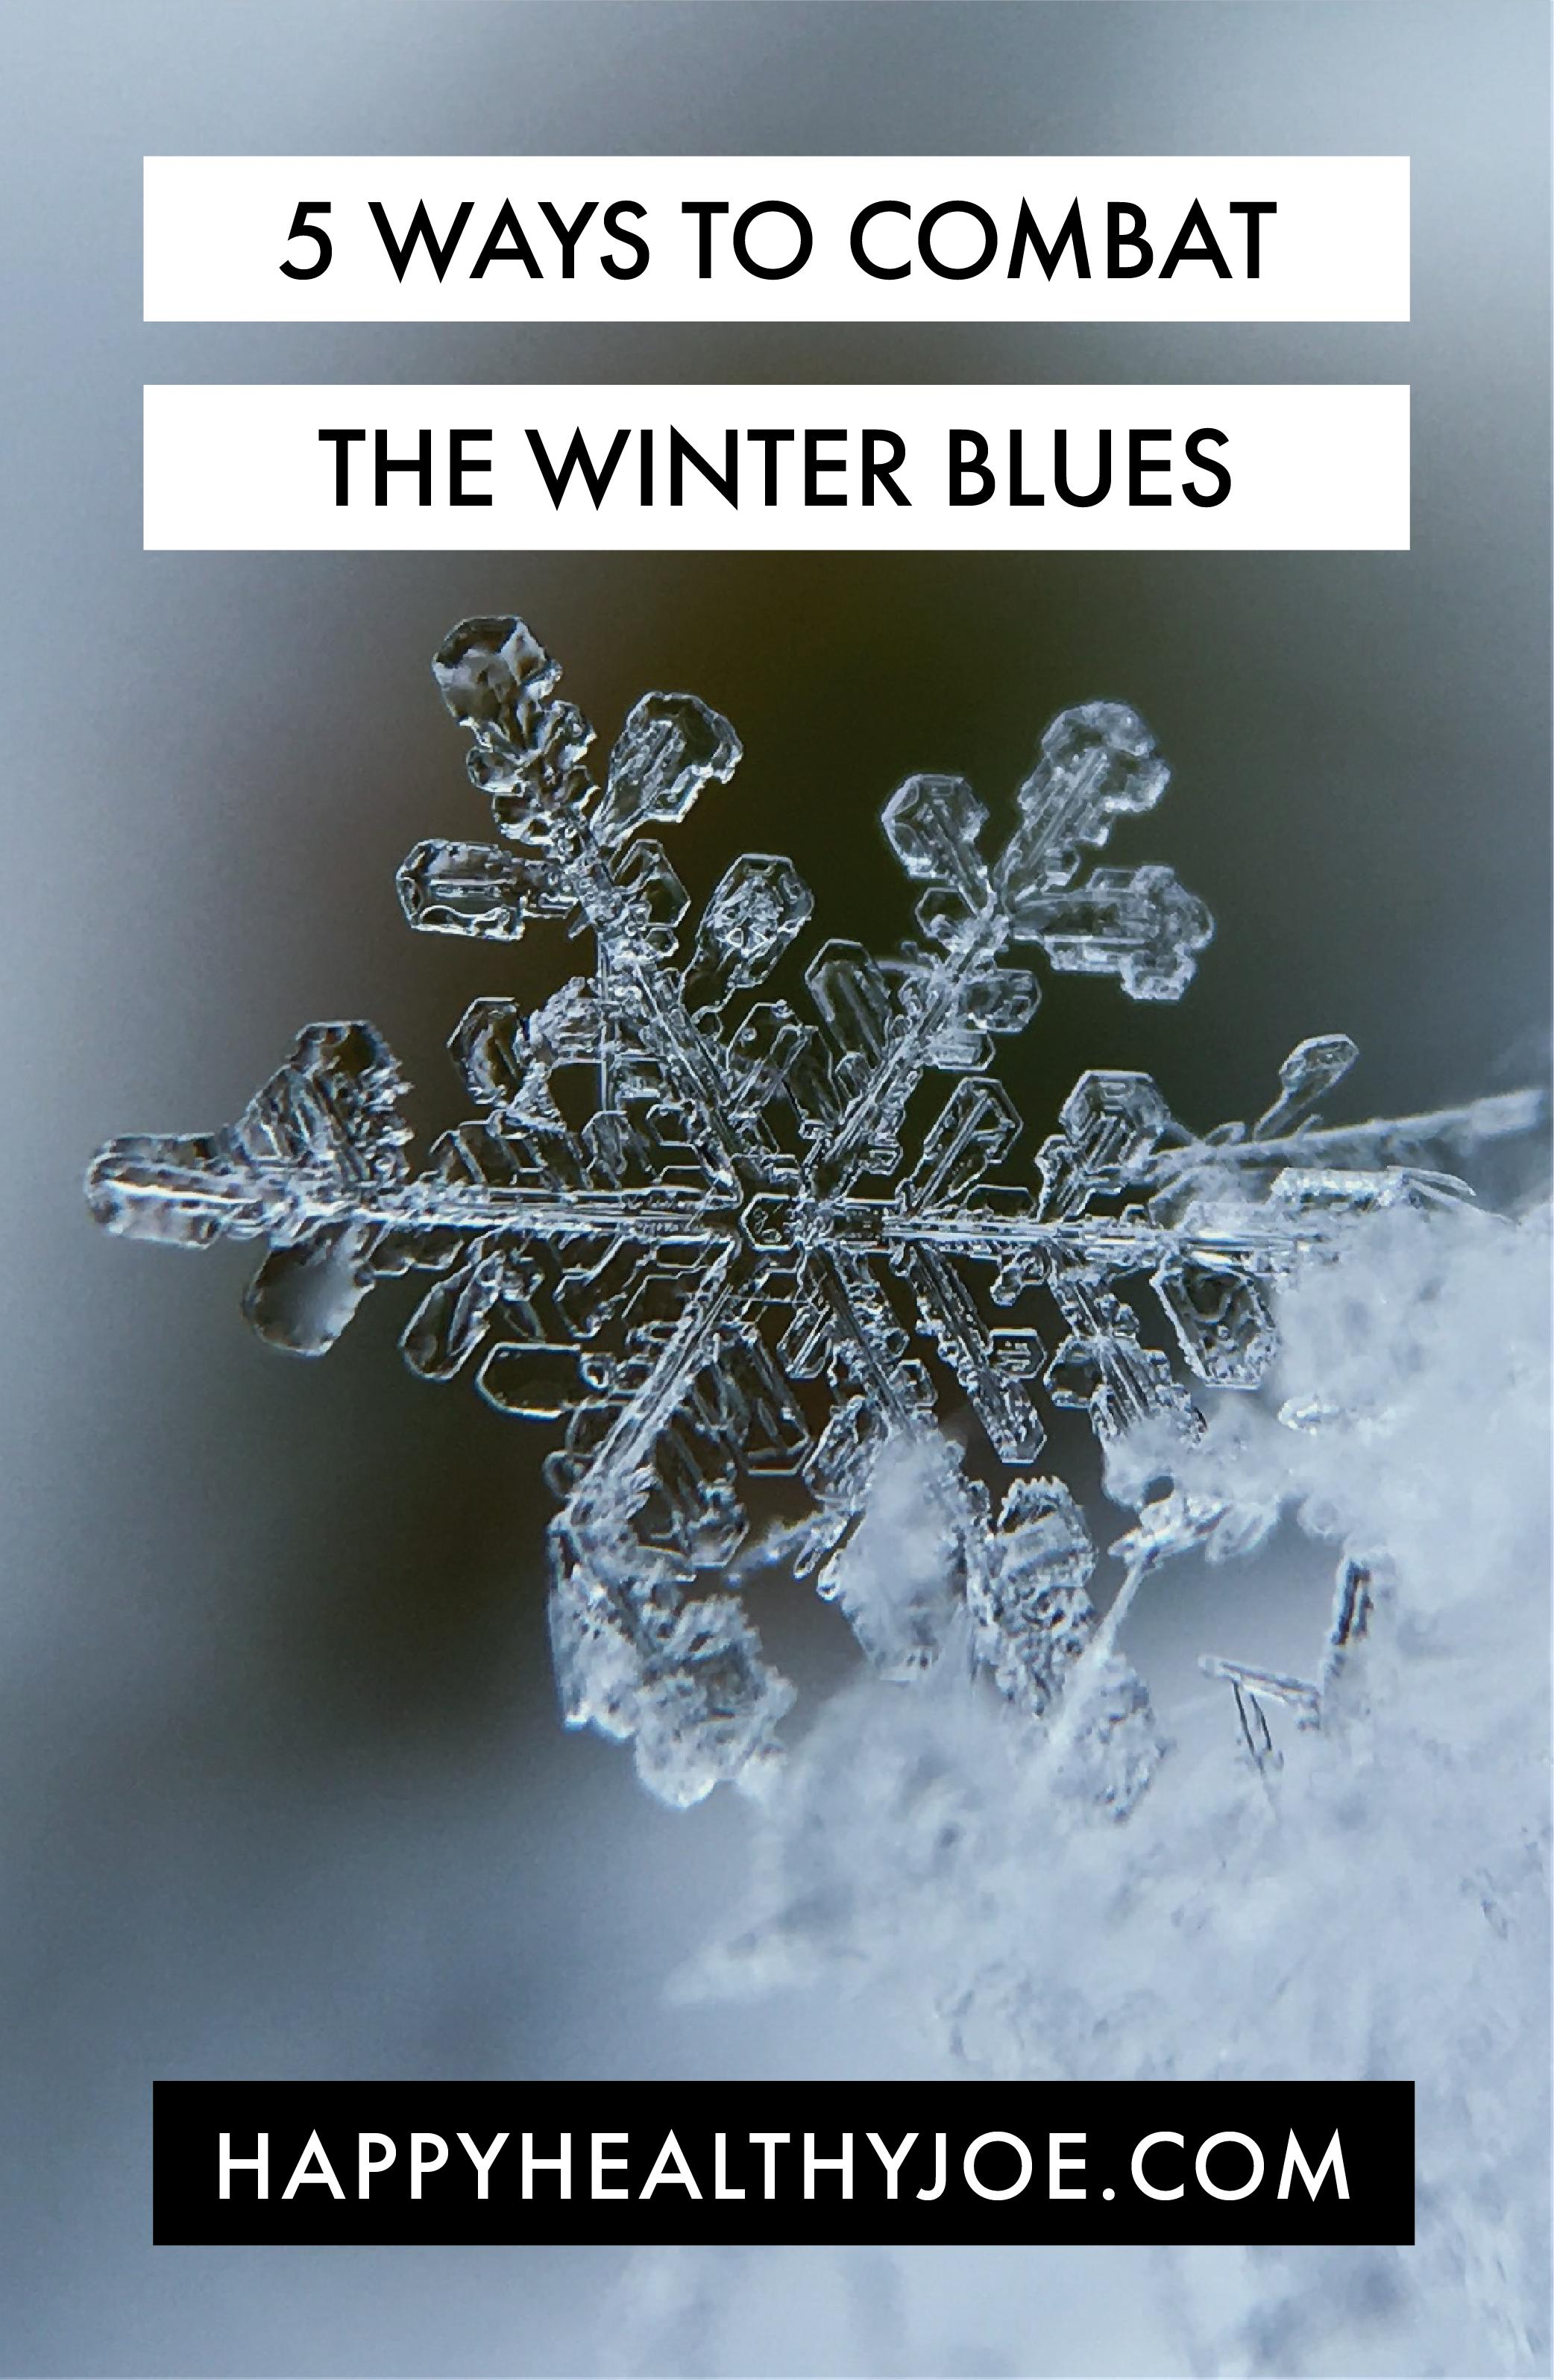 5 Ways To Combat Winter Blues